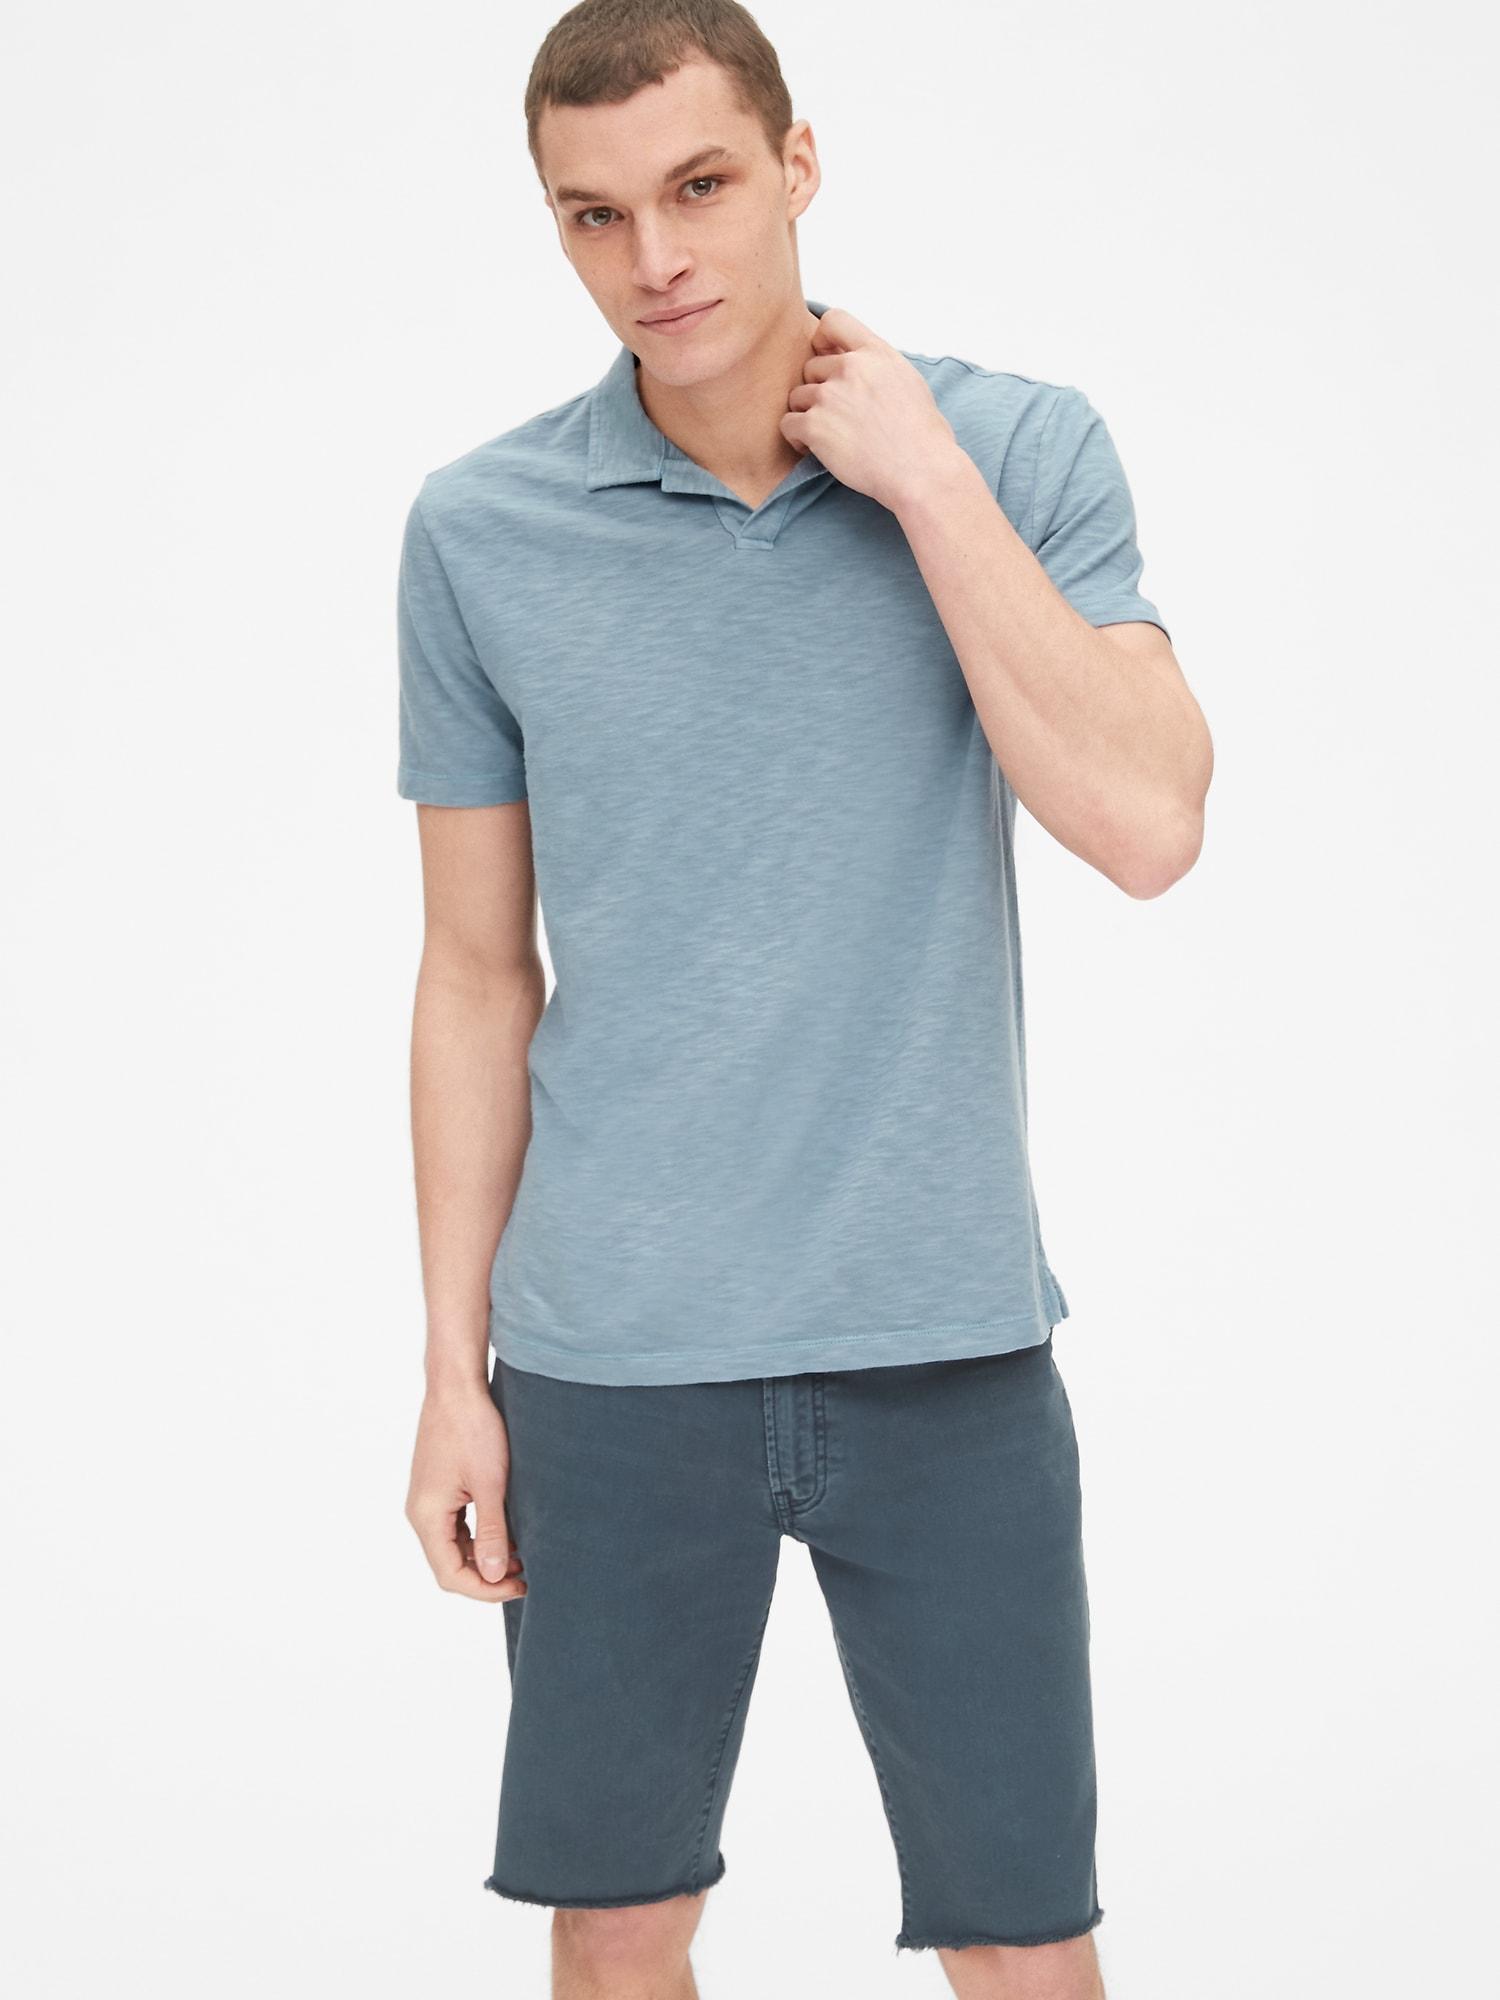 adfac2552 Lyst - Gap Vintage Slub Jersey Polo Shirt in Blue for Men